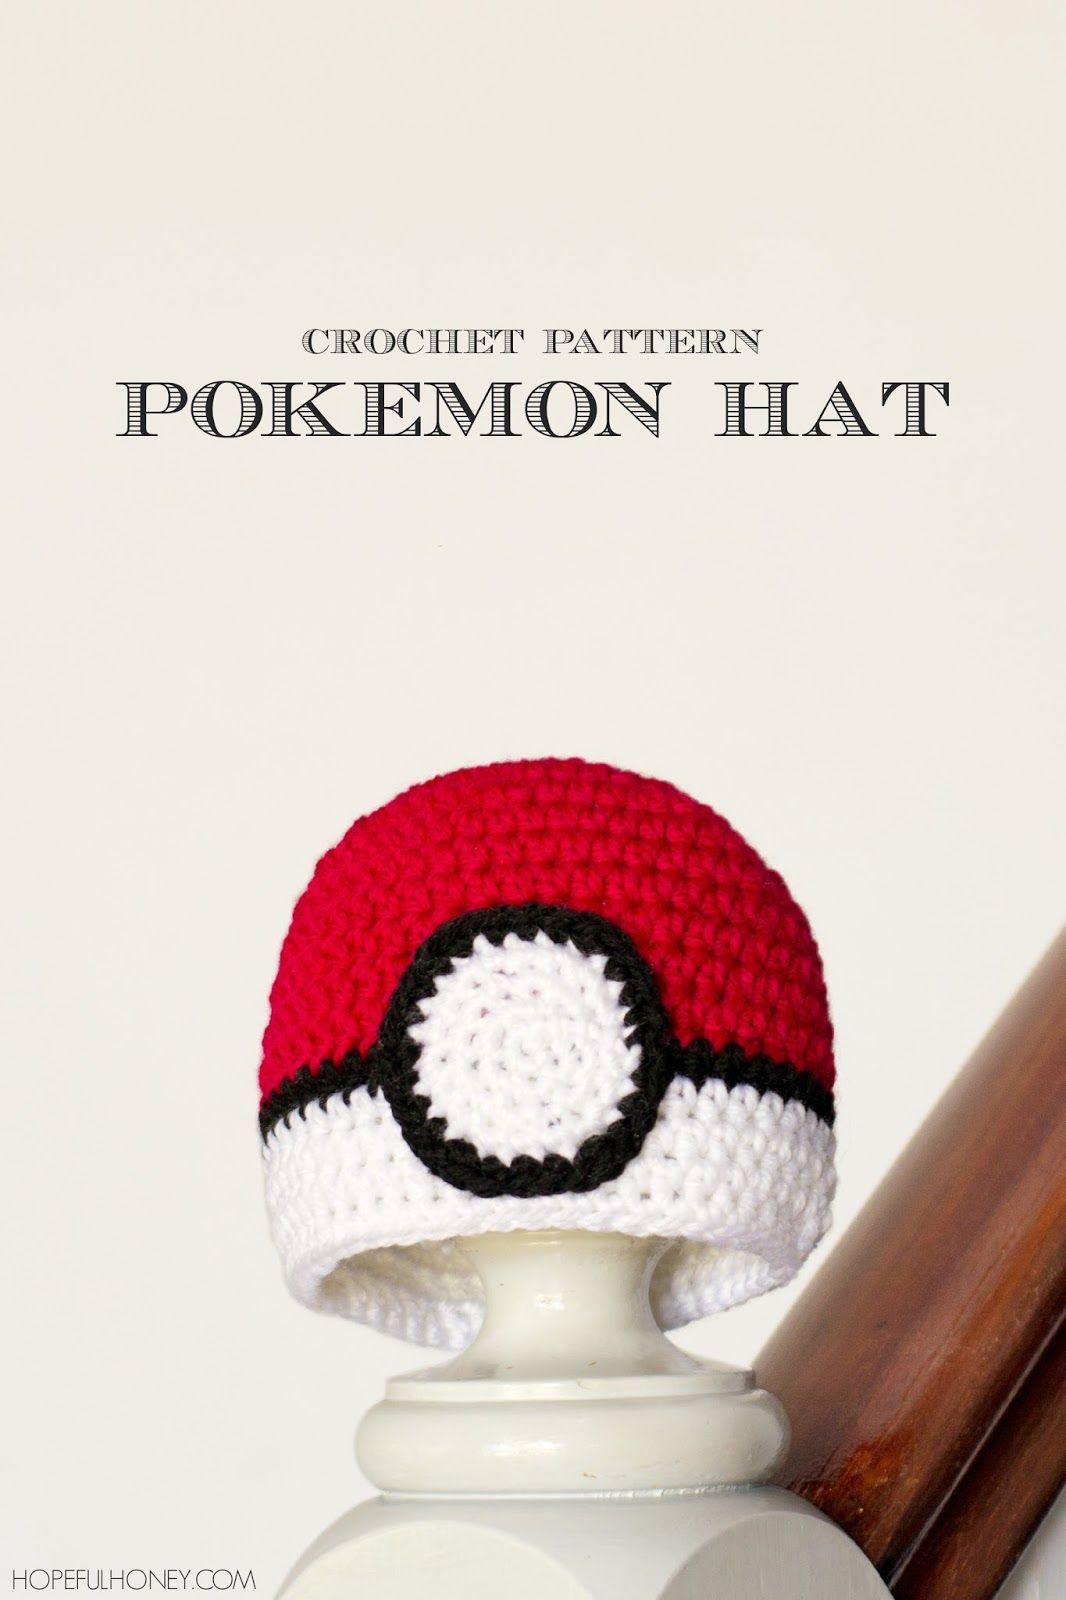 Pokémon Pokéball Inspired Baby Hat - Free Crochet Pattern | crochet ...